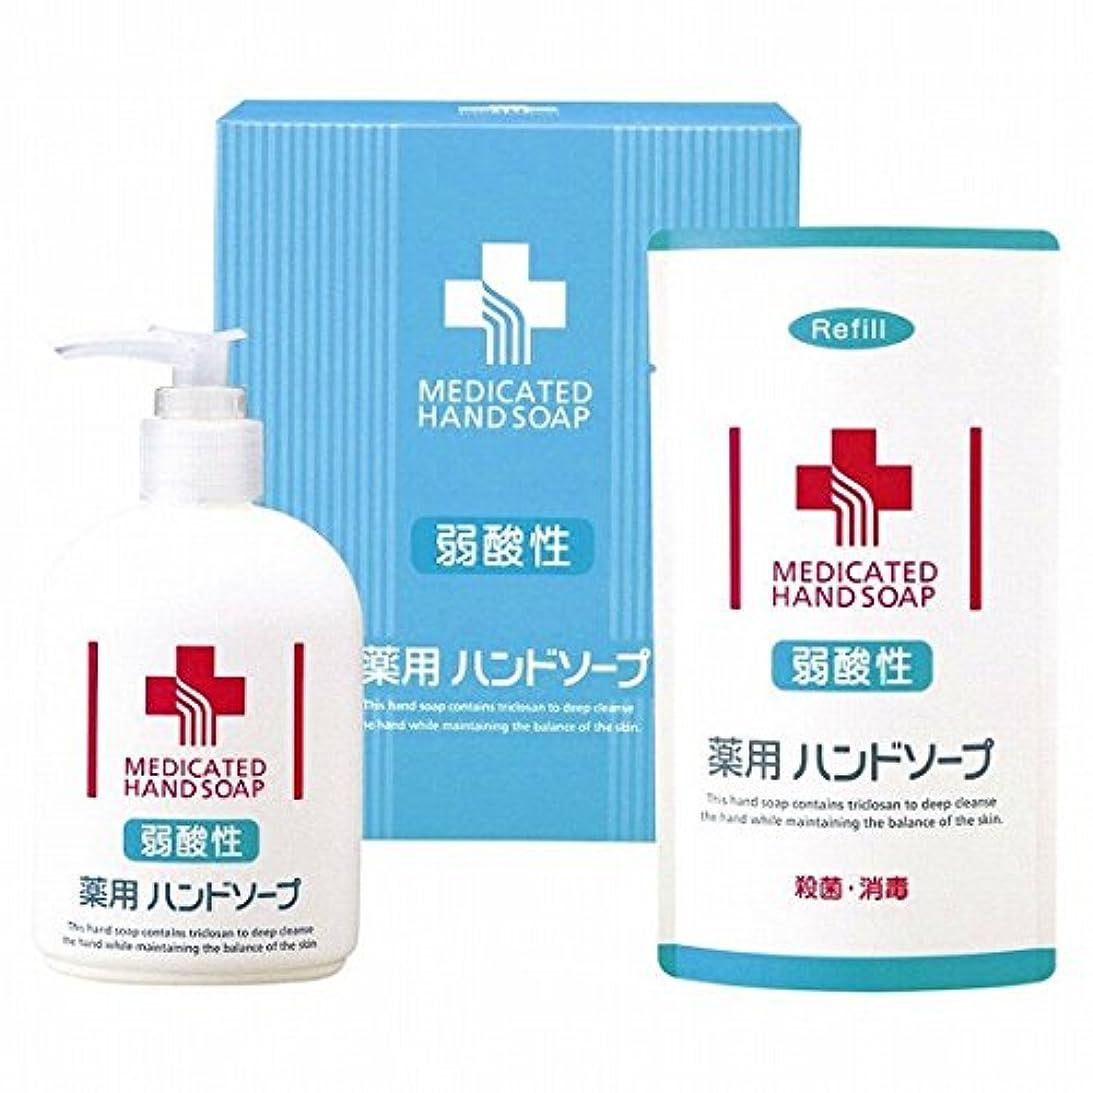 nobrand 弱酸性 薬用ハンドソープセット(21957015)